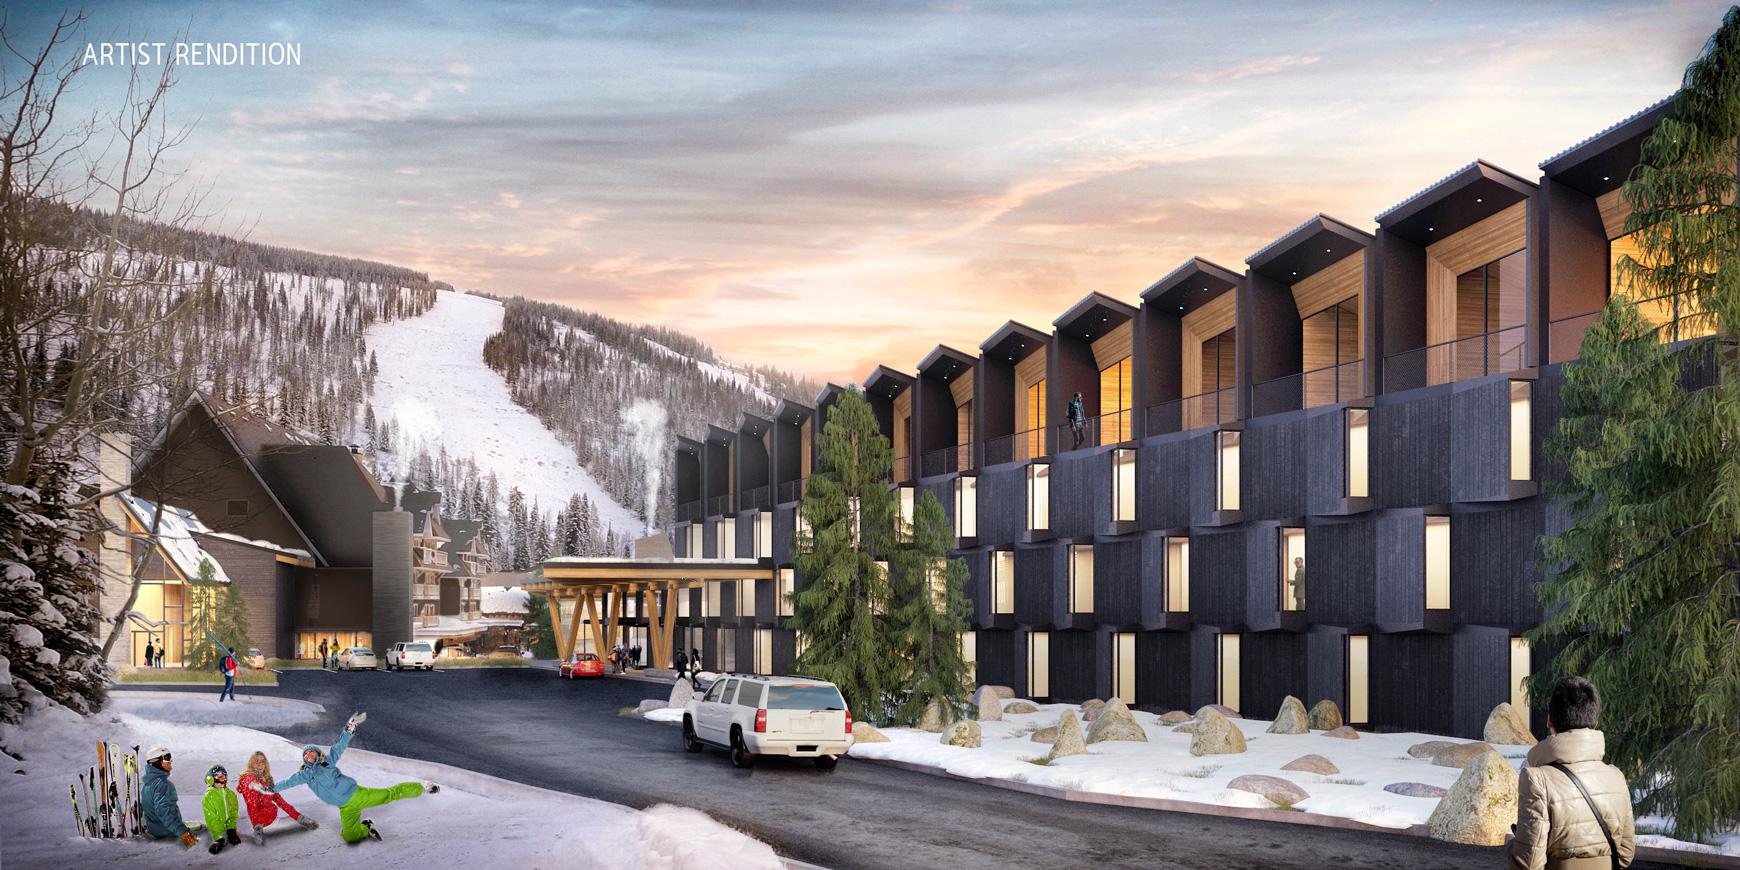 schweitzer-hotel-arrival-view-2019